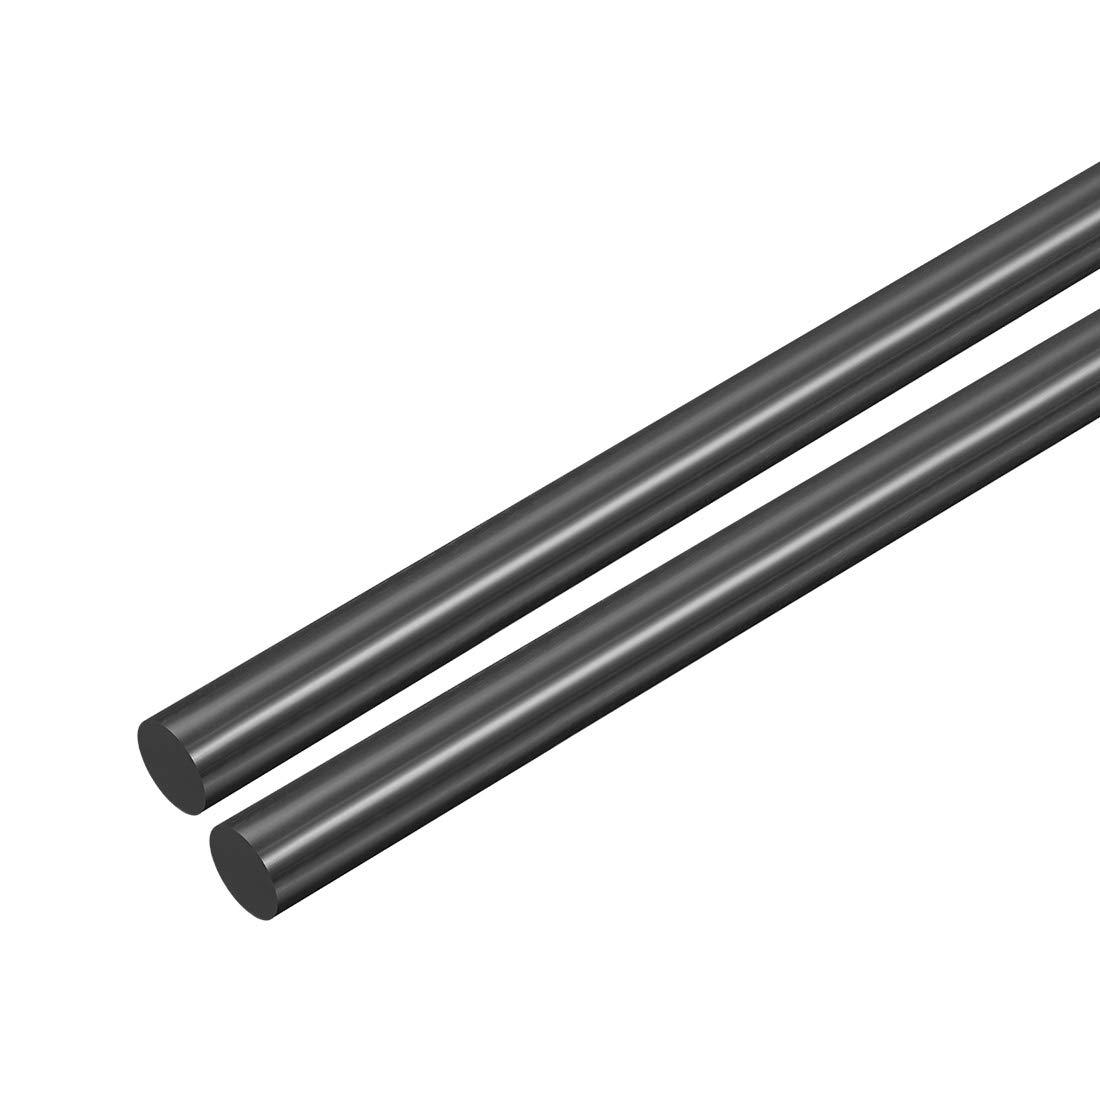 POM 1//8 Dia 20 Length White Engineering Plastic Round Bars Polyoxymethylene Rods sourcing map 2pcs Plastic Round Rod 3mm